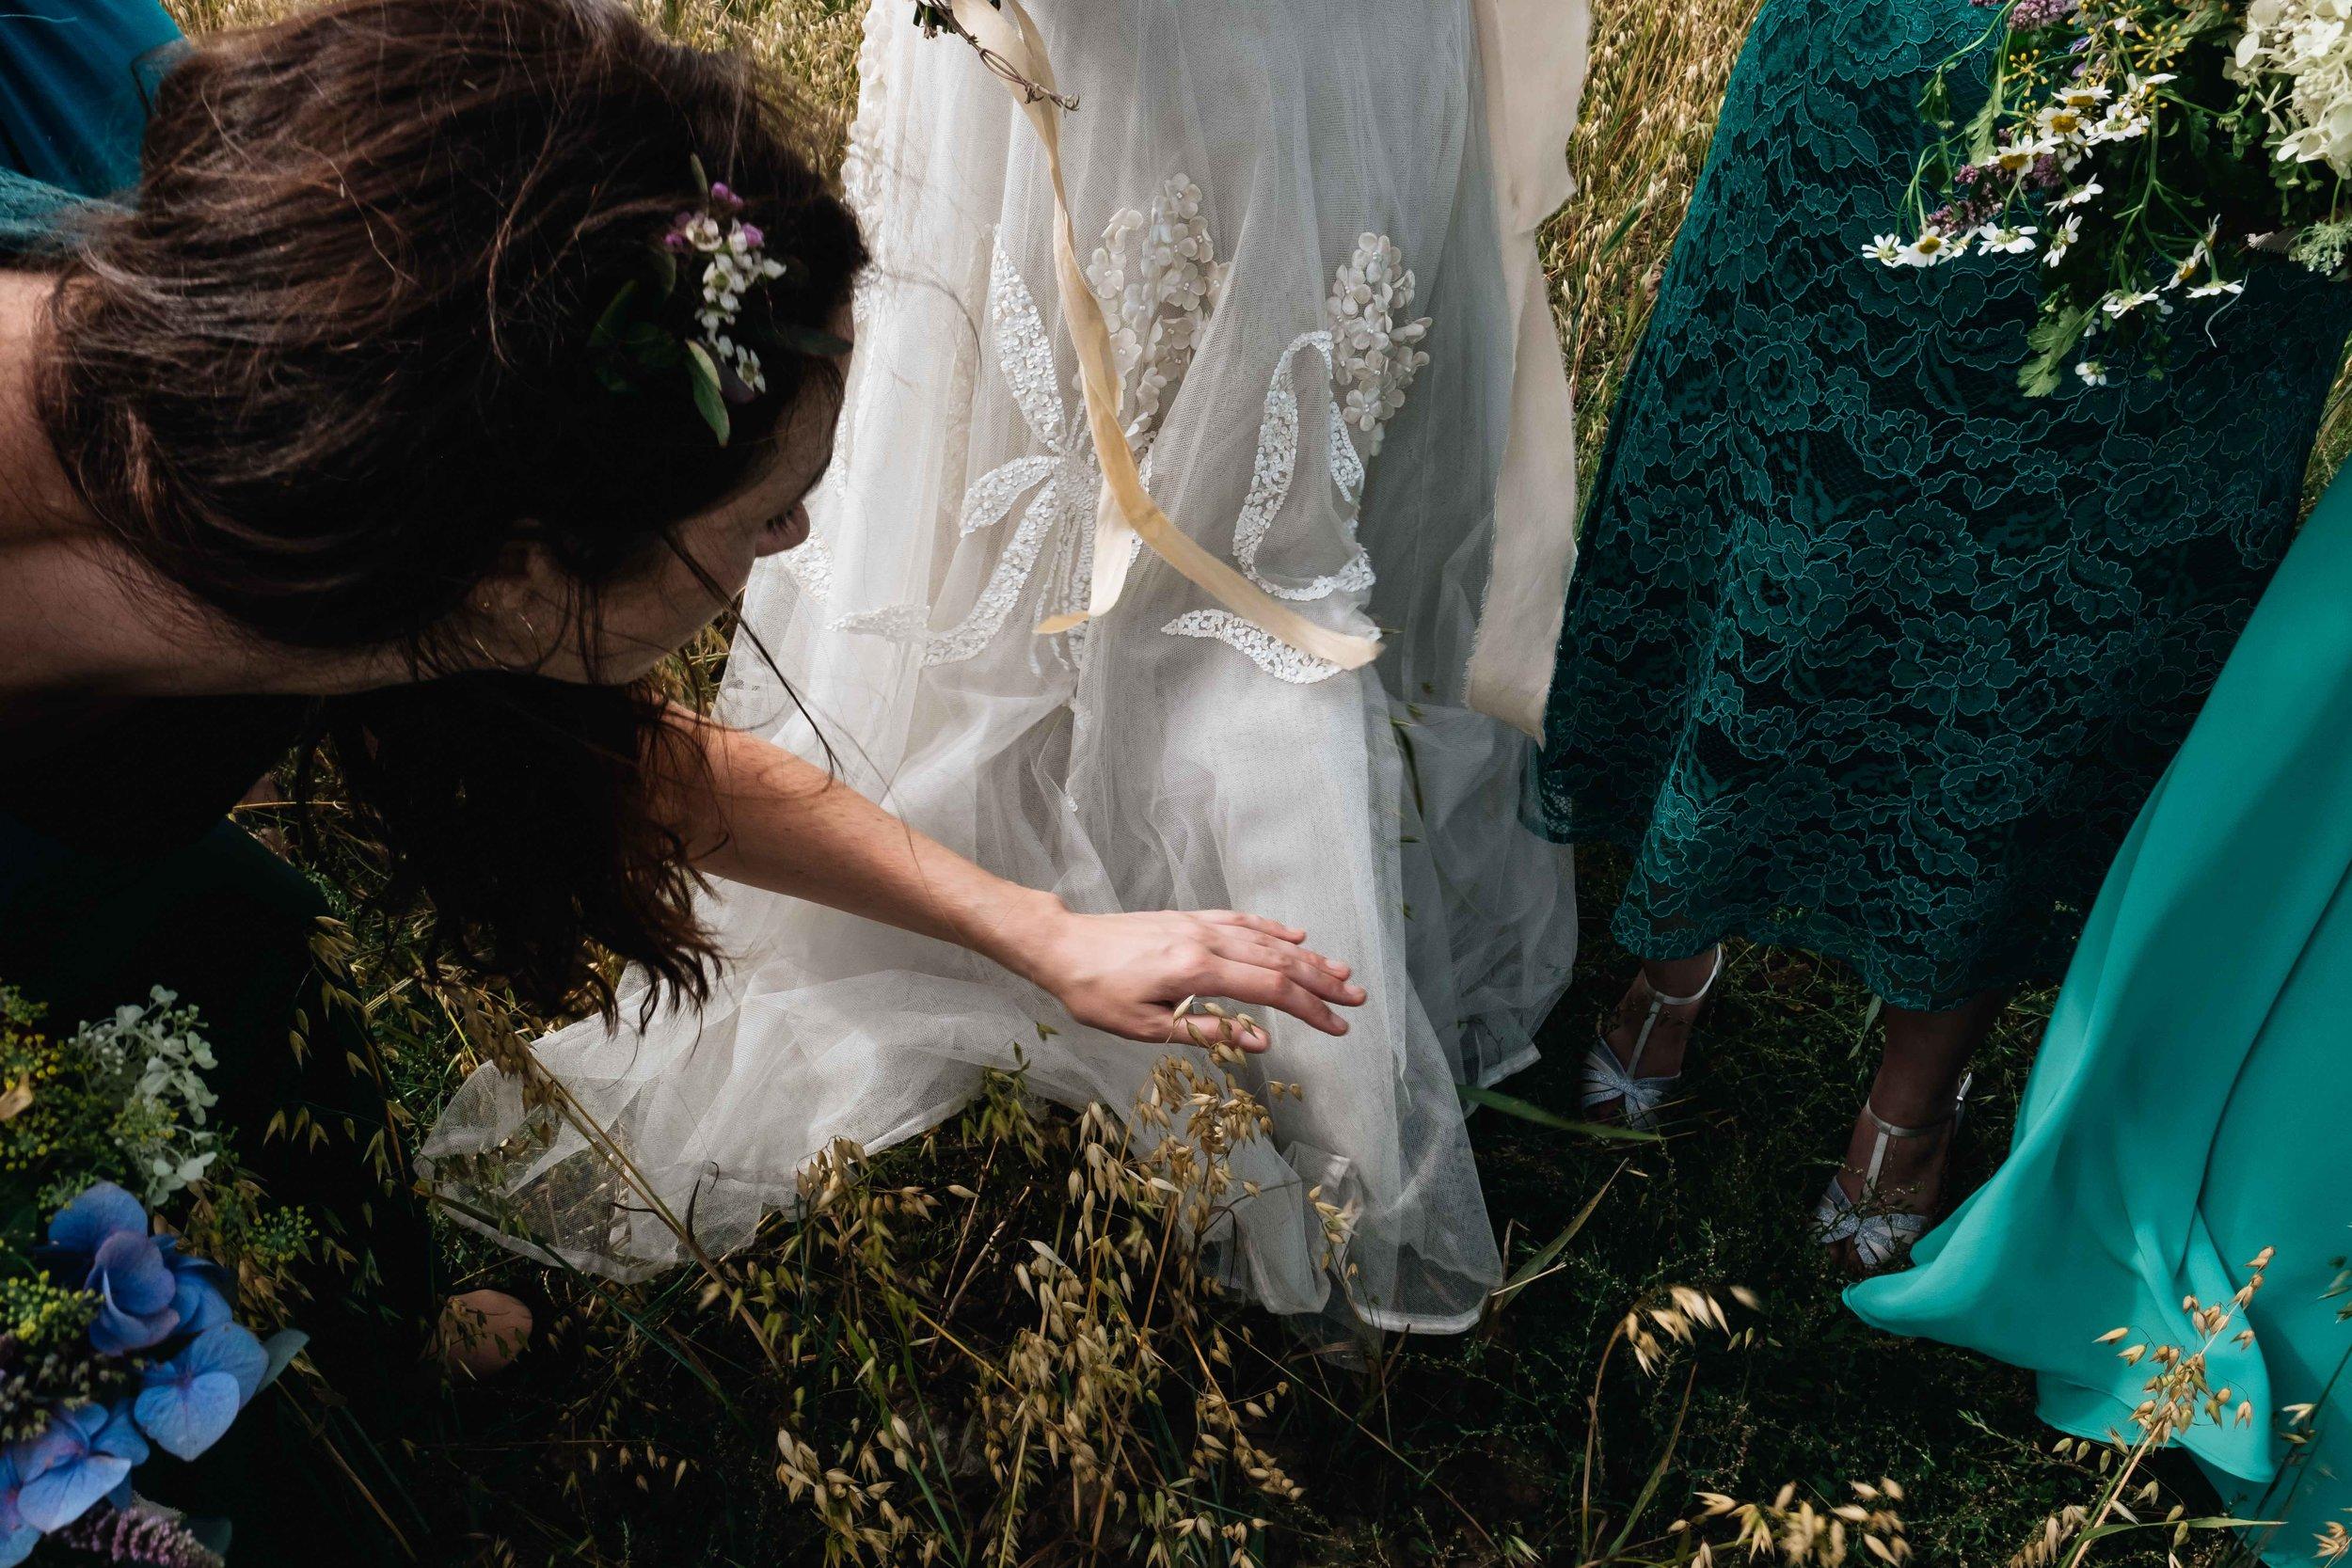 bridesmaid helping loosen bride's dress that's stuck on grass